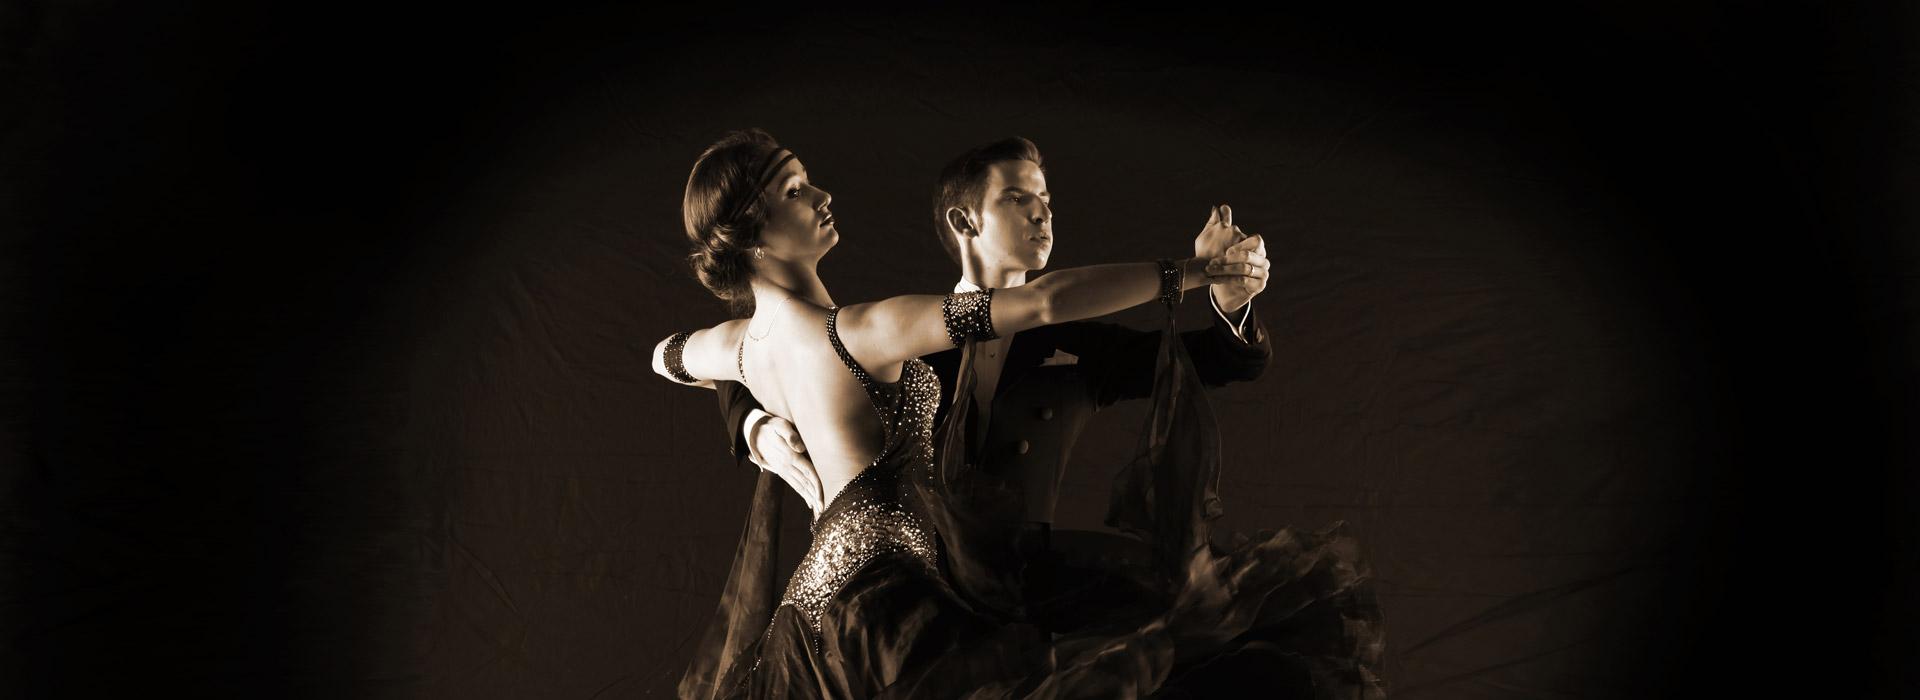 ballroom-dancing3